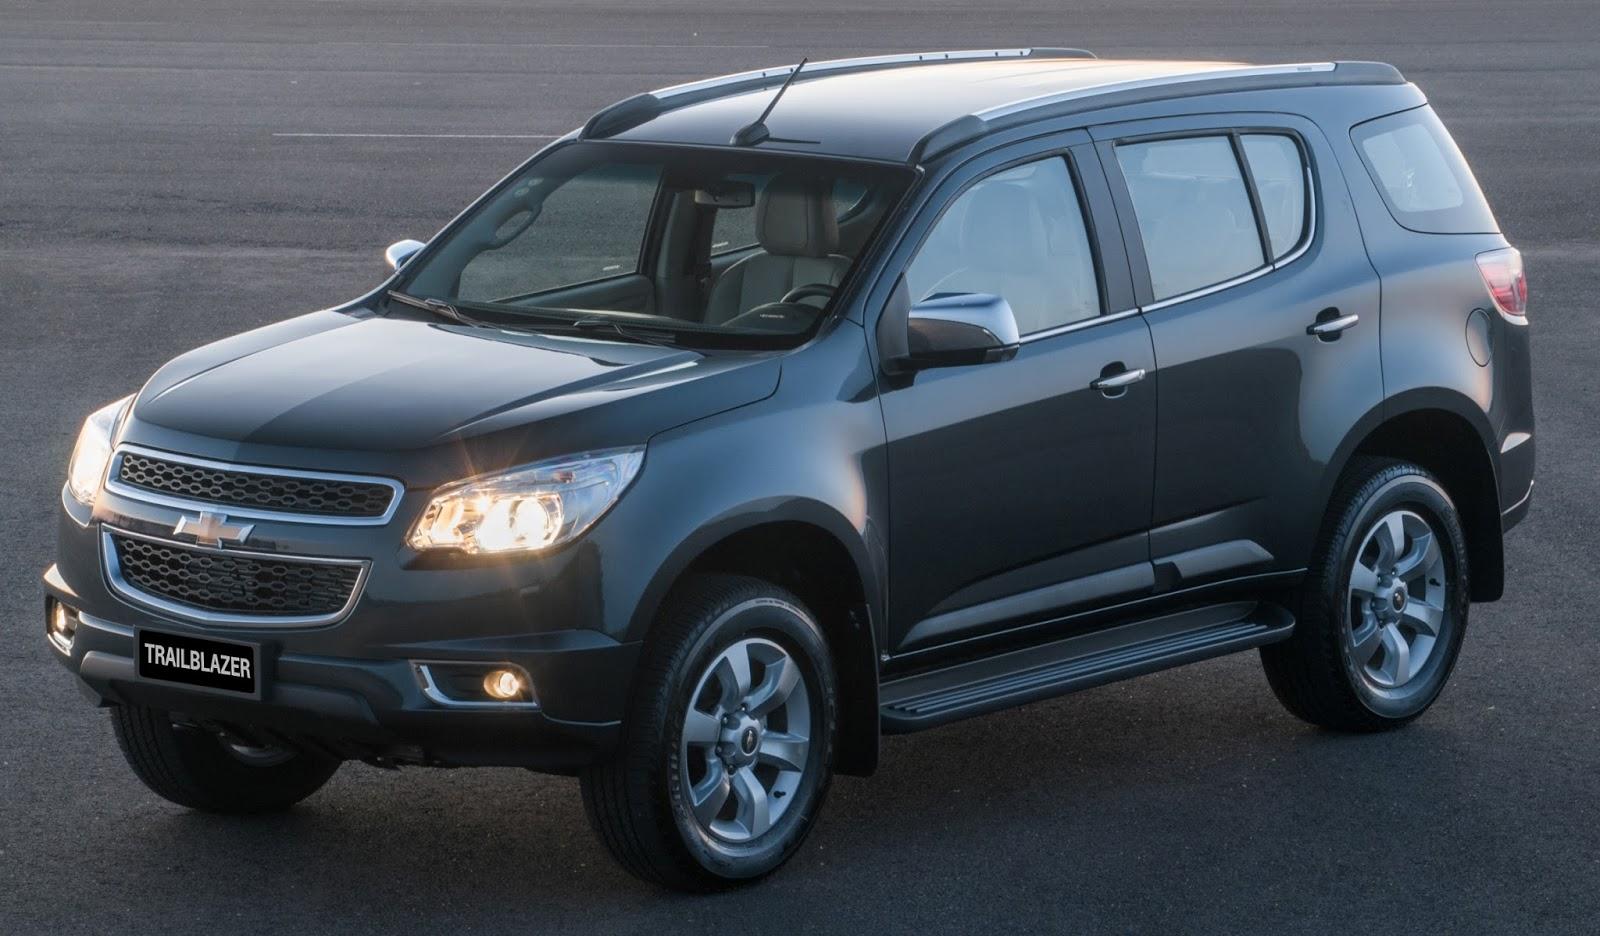 chevy trailblazer 2014 autos weblog. Cars Review. Best American Auto & Cars Review